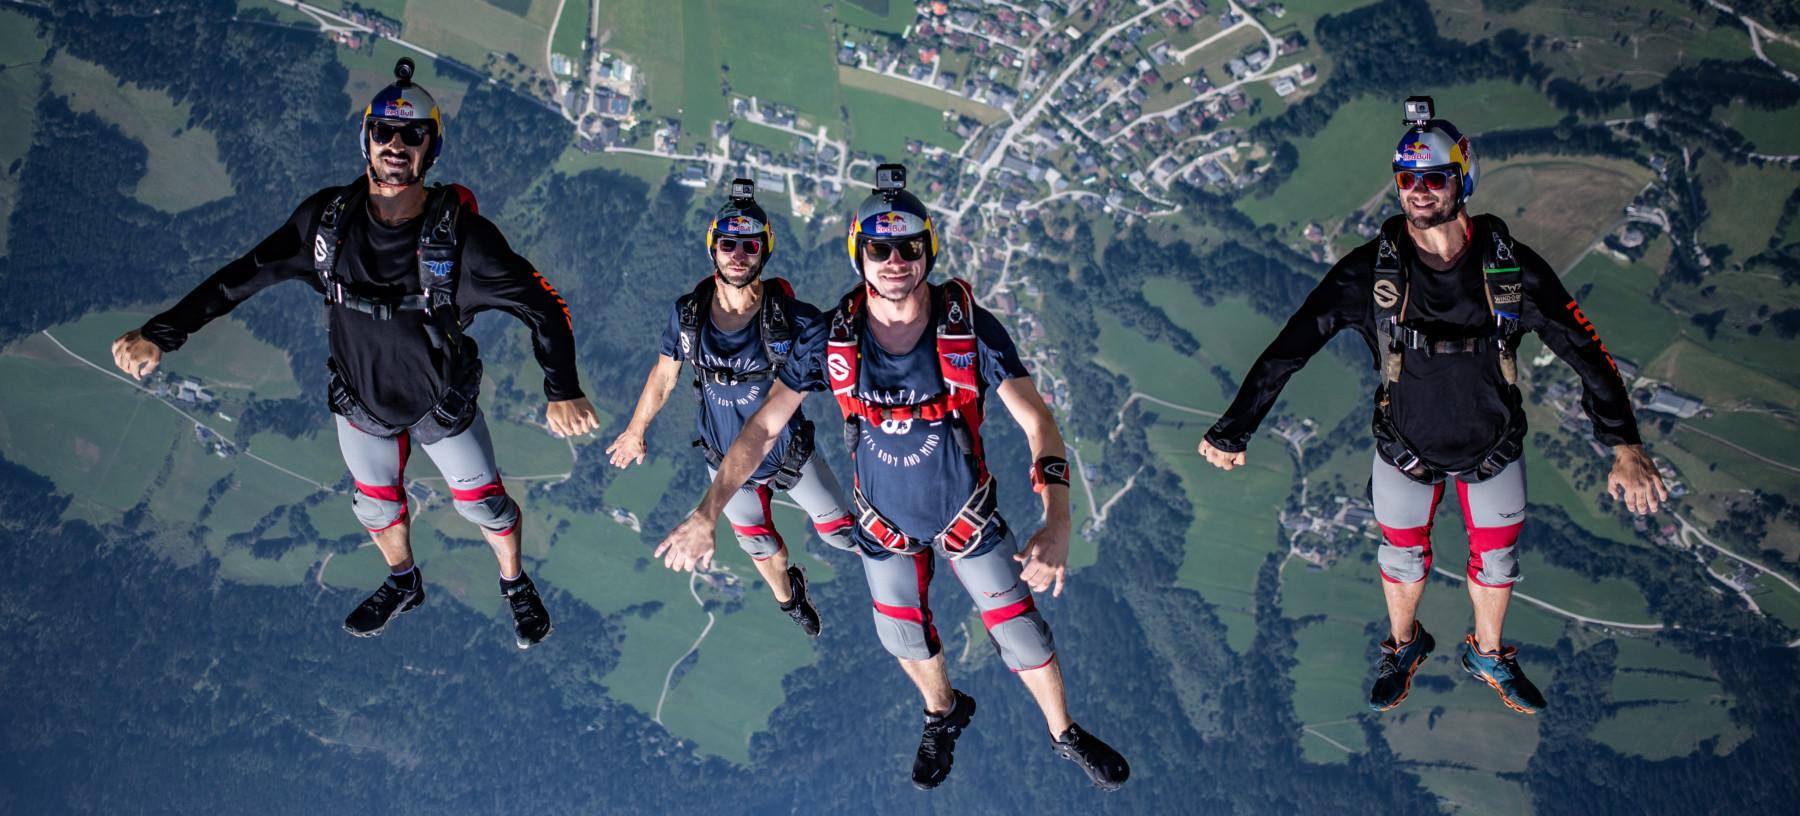 Red Bull Skydive >> Red Bull Skydive Team